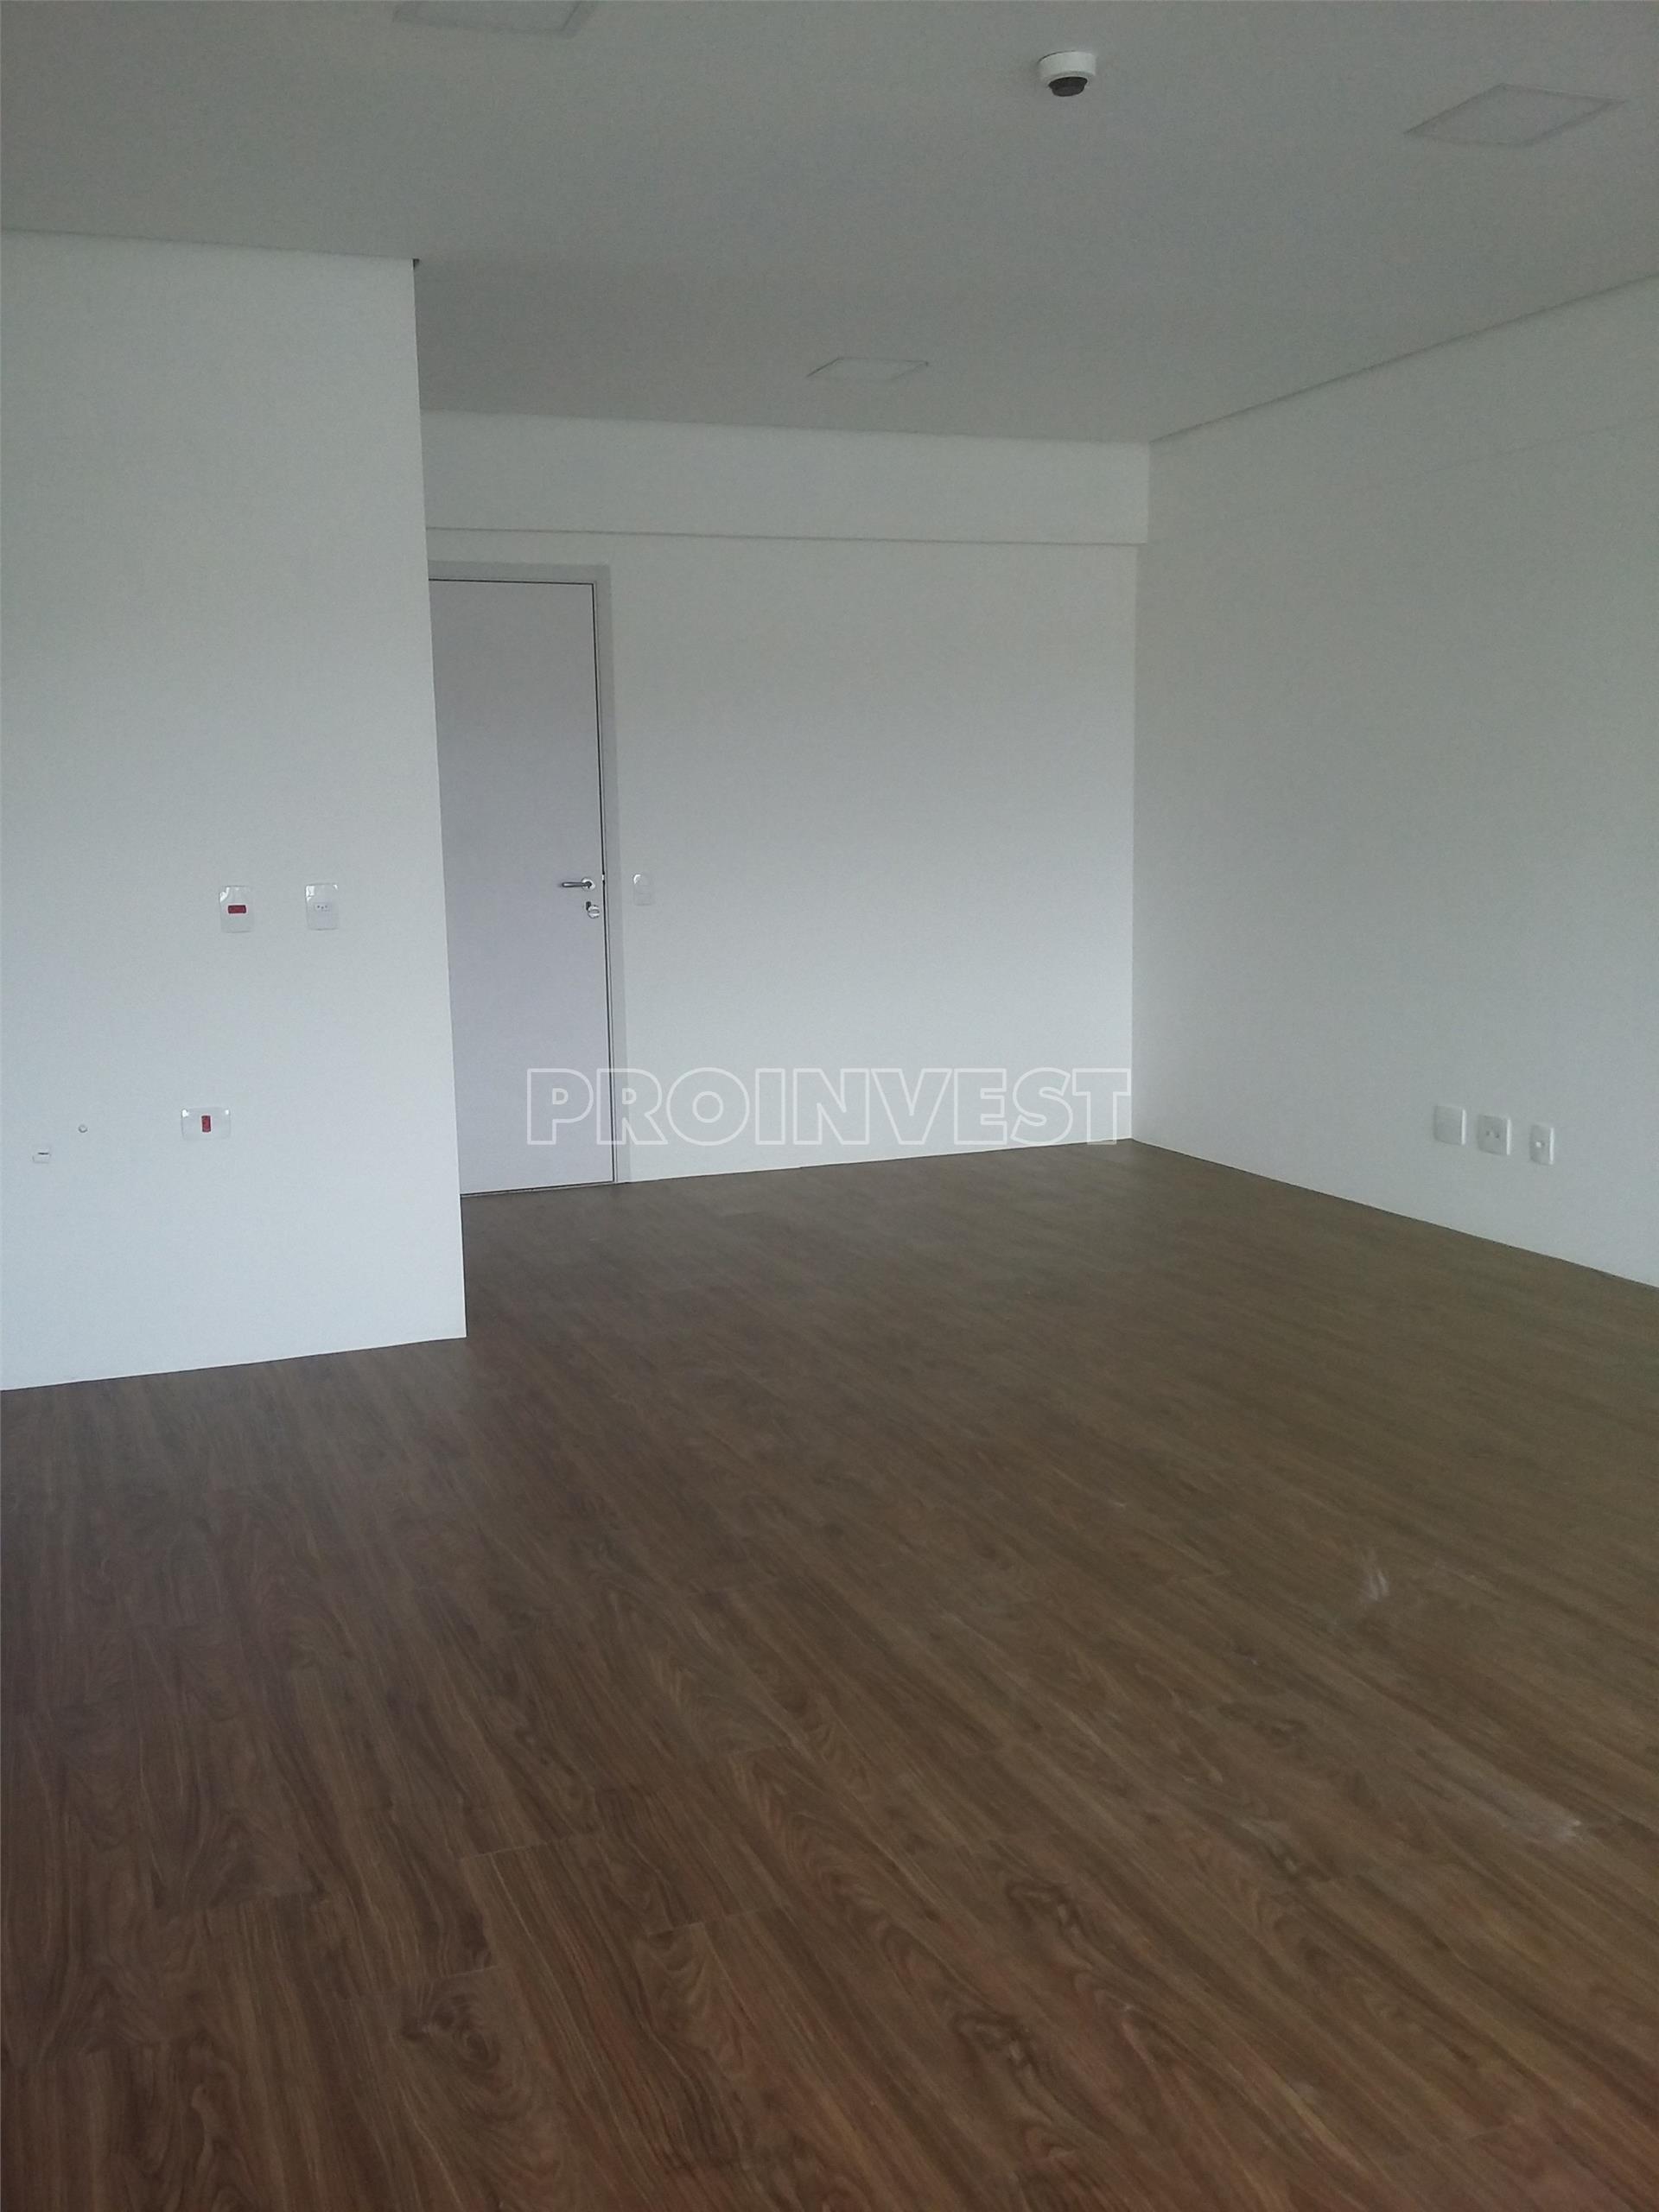 Sala em The Point Office, Cotia - SP